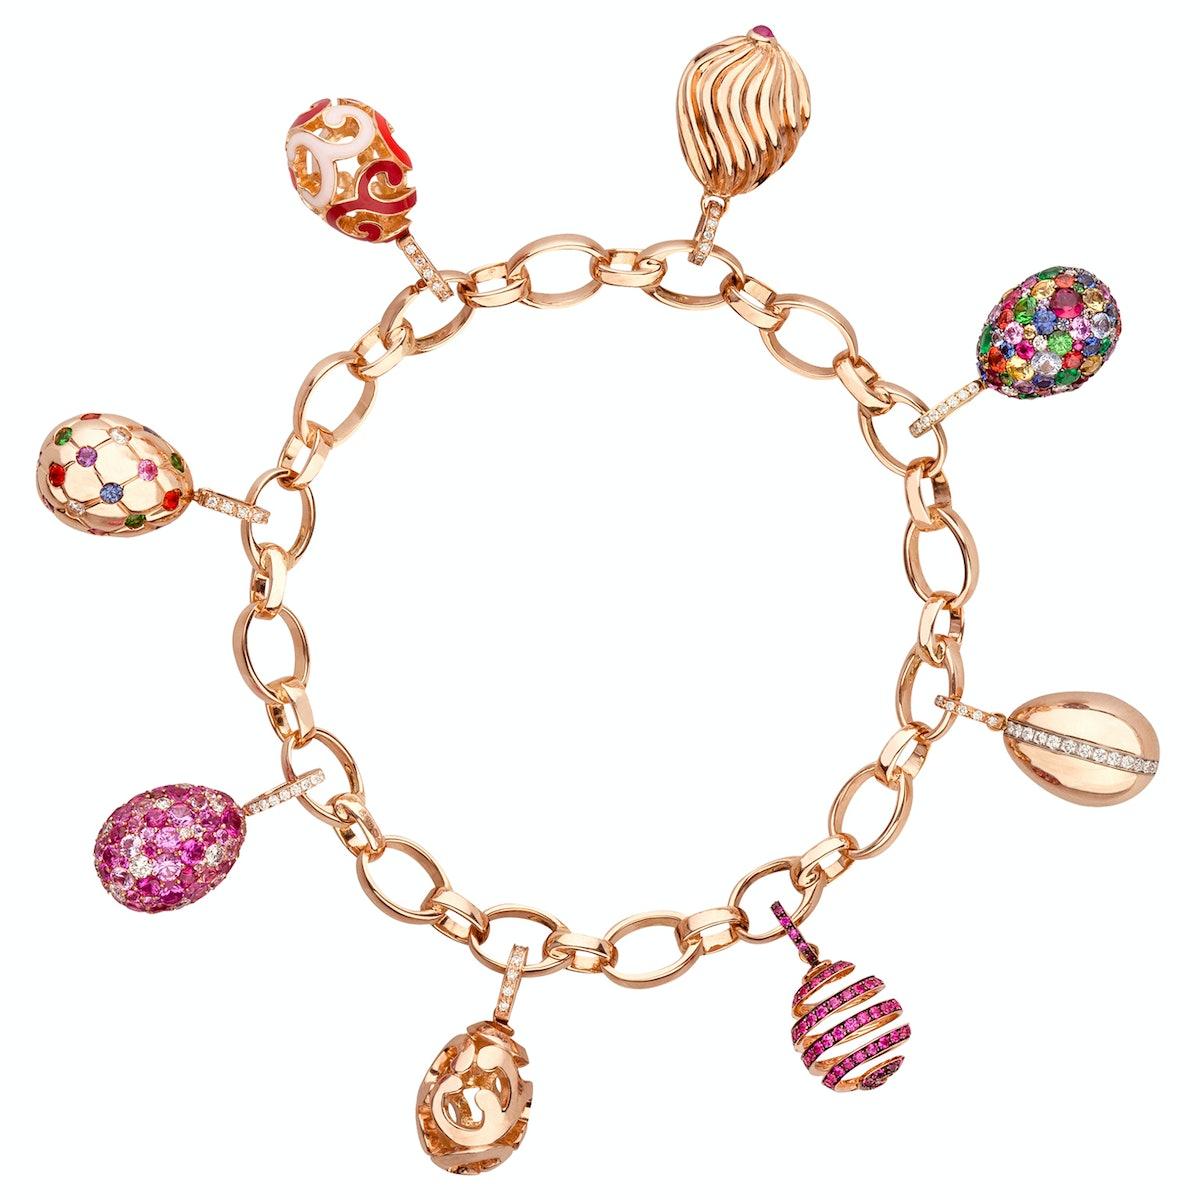 Fabergé gold bracelet